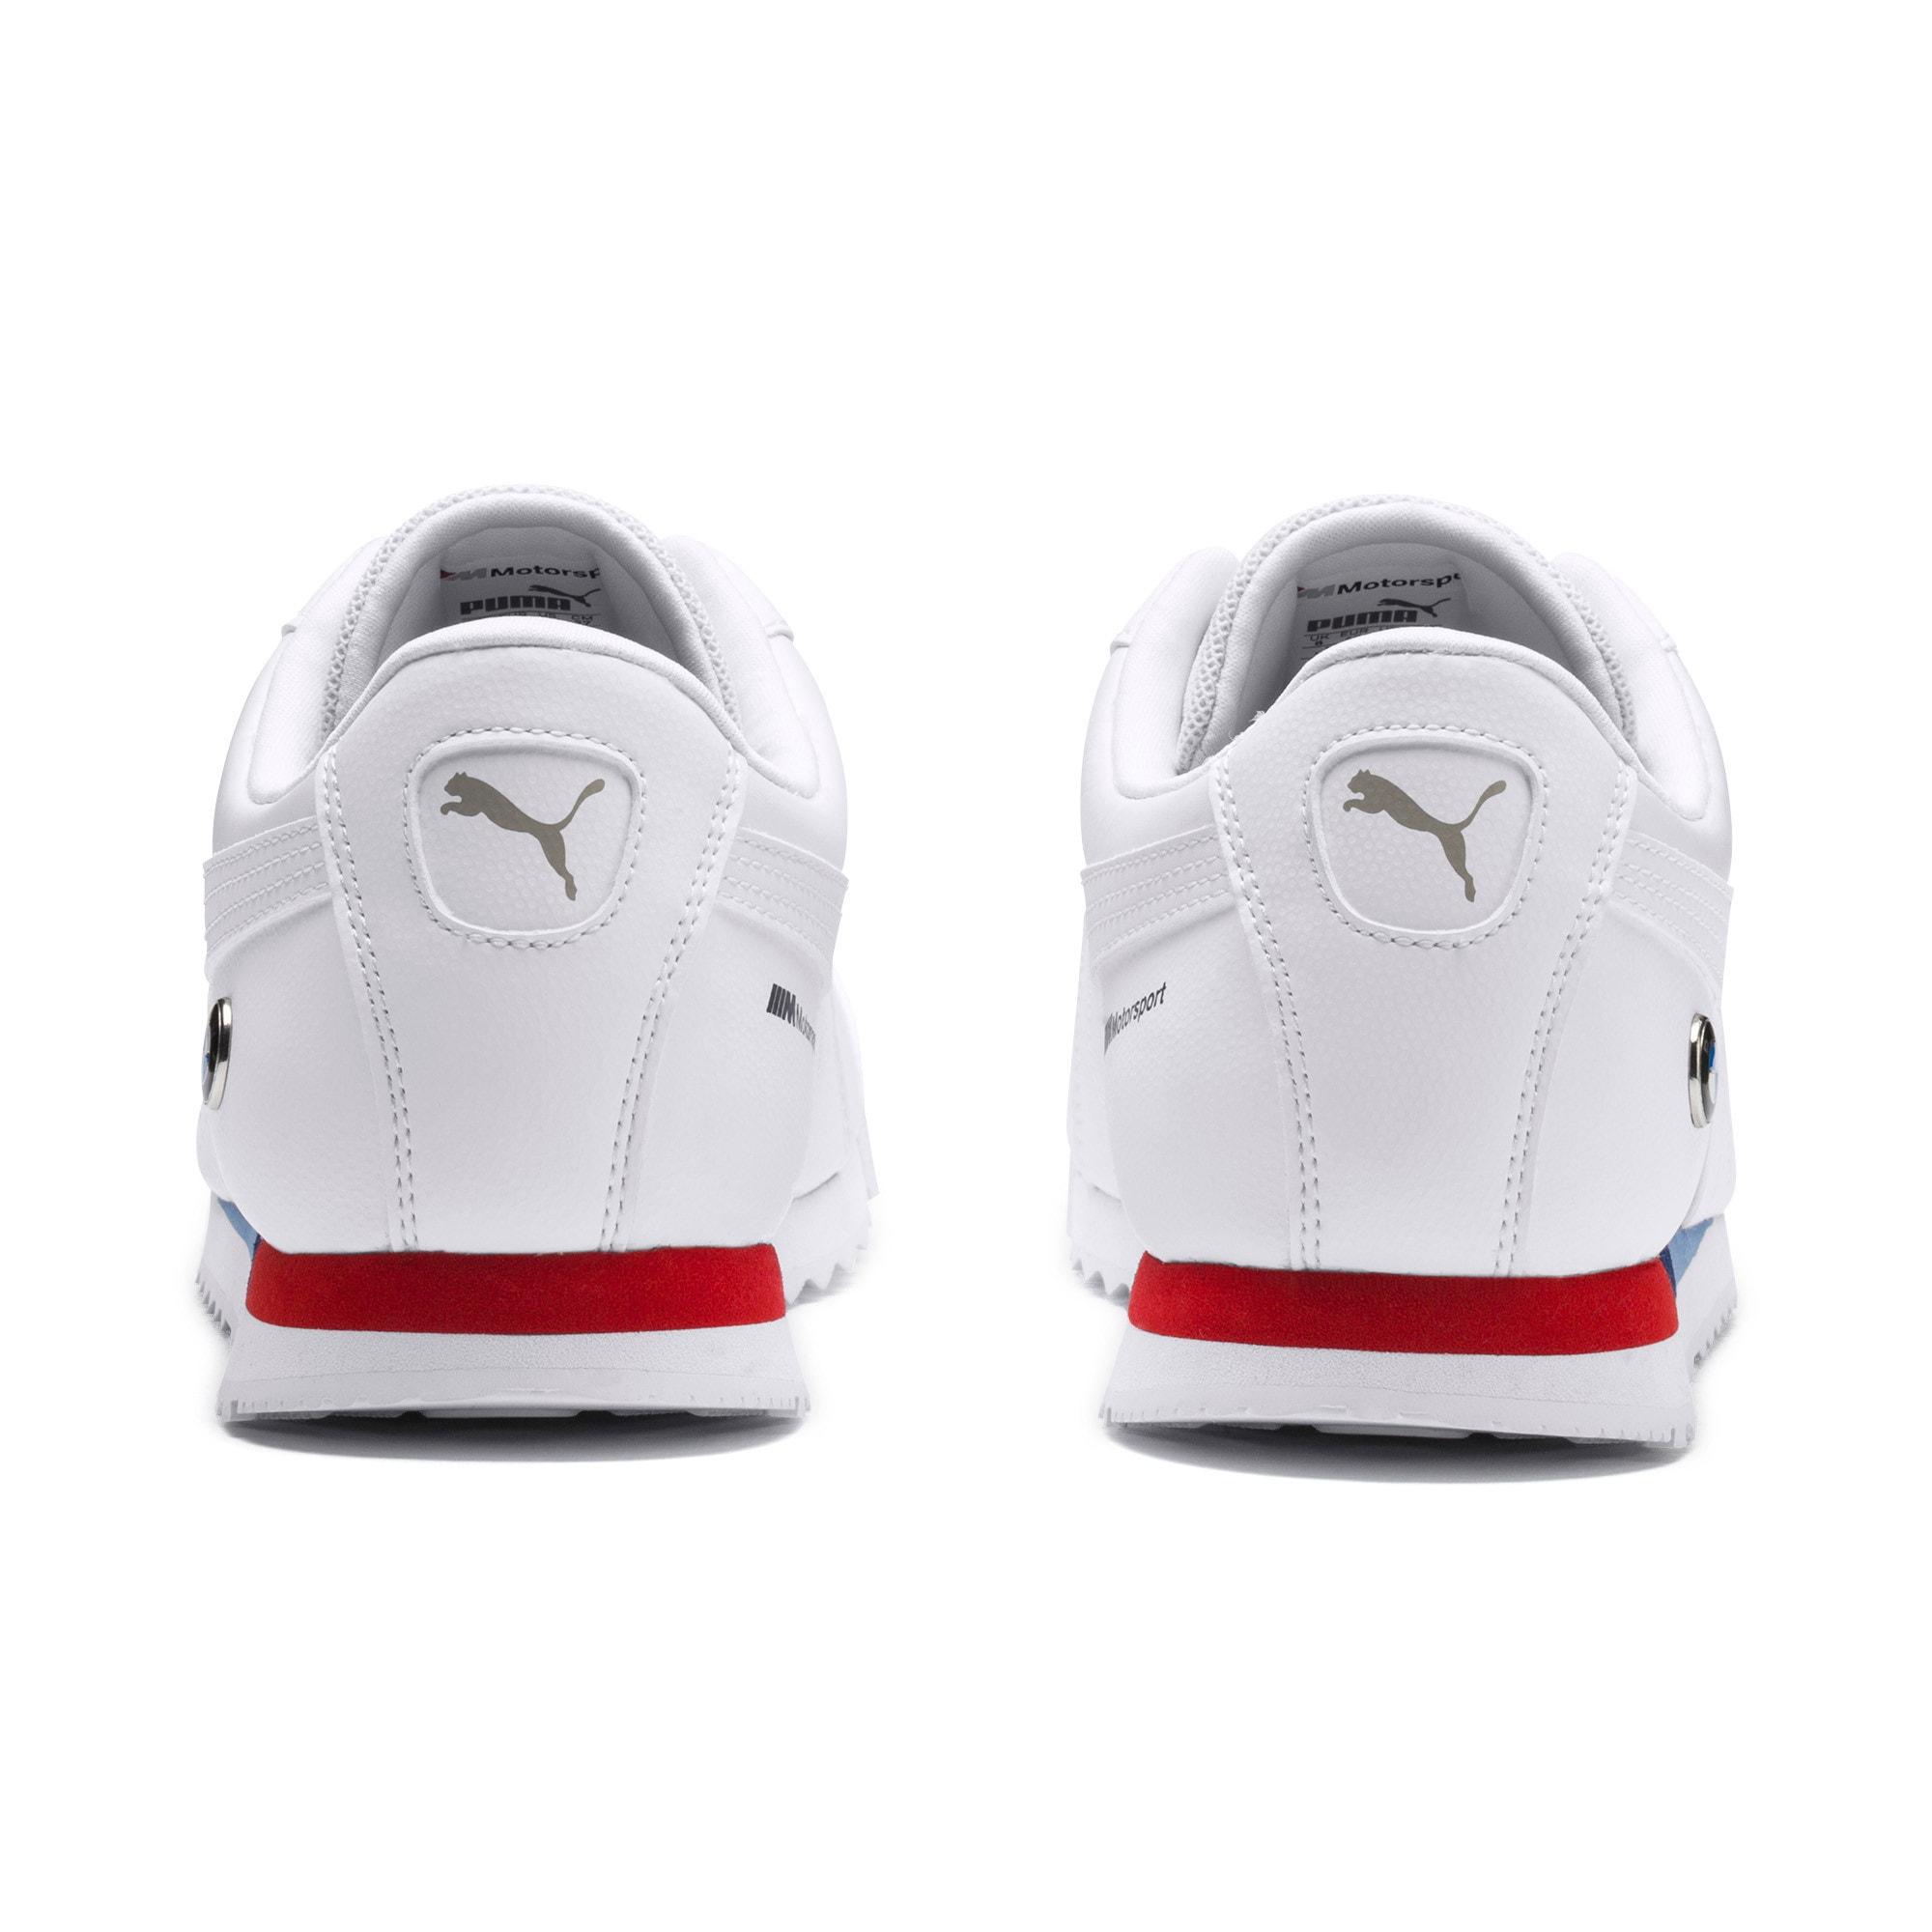 Thumbnail 3 of BMW M Motorsport Roma Herren Sneaker, Puma White-Puma White, medium